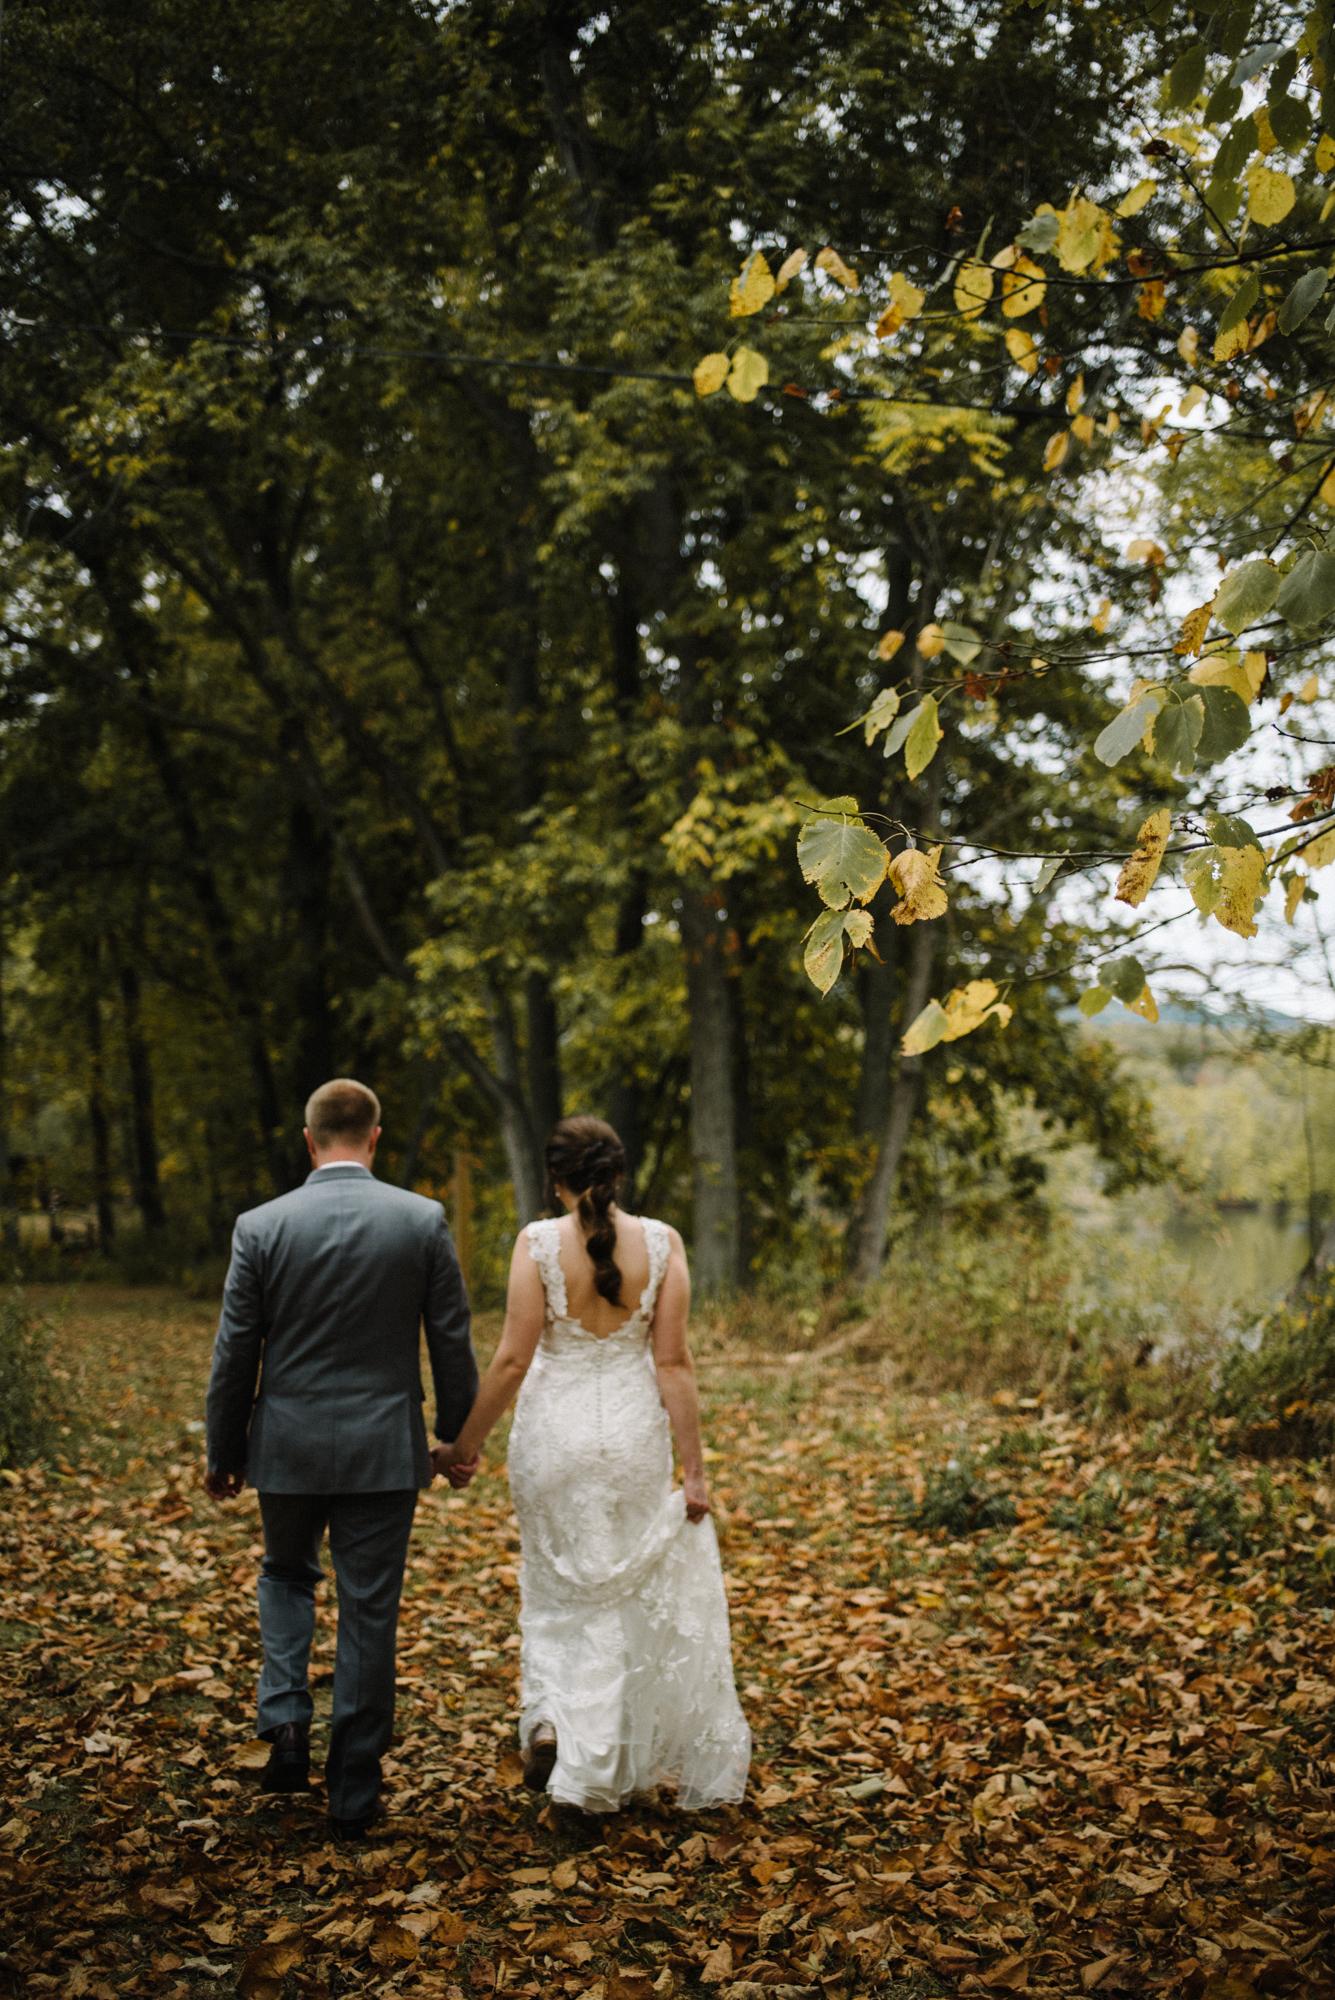 Mandi-and-Jordan-Intimate-Backyard-River-Wedding-Shenandoah-Valley_39.JPG